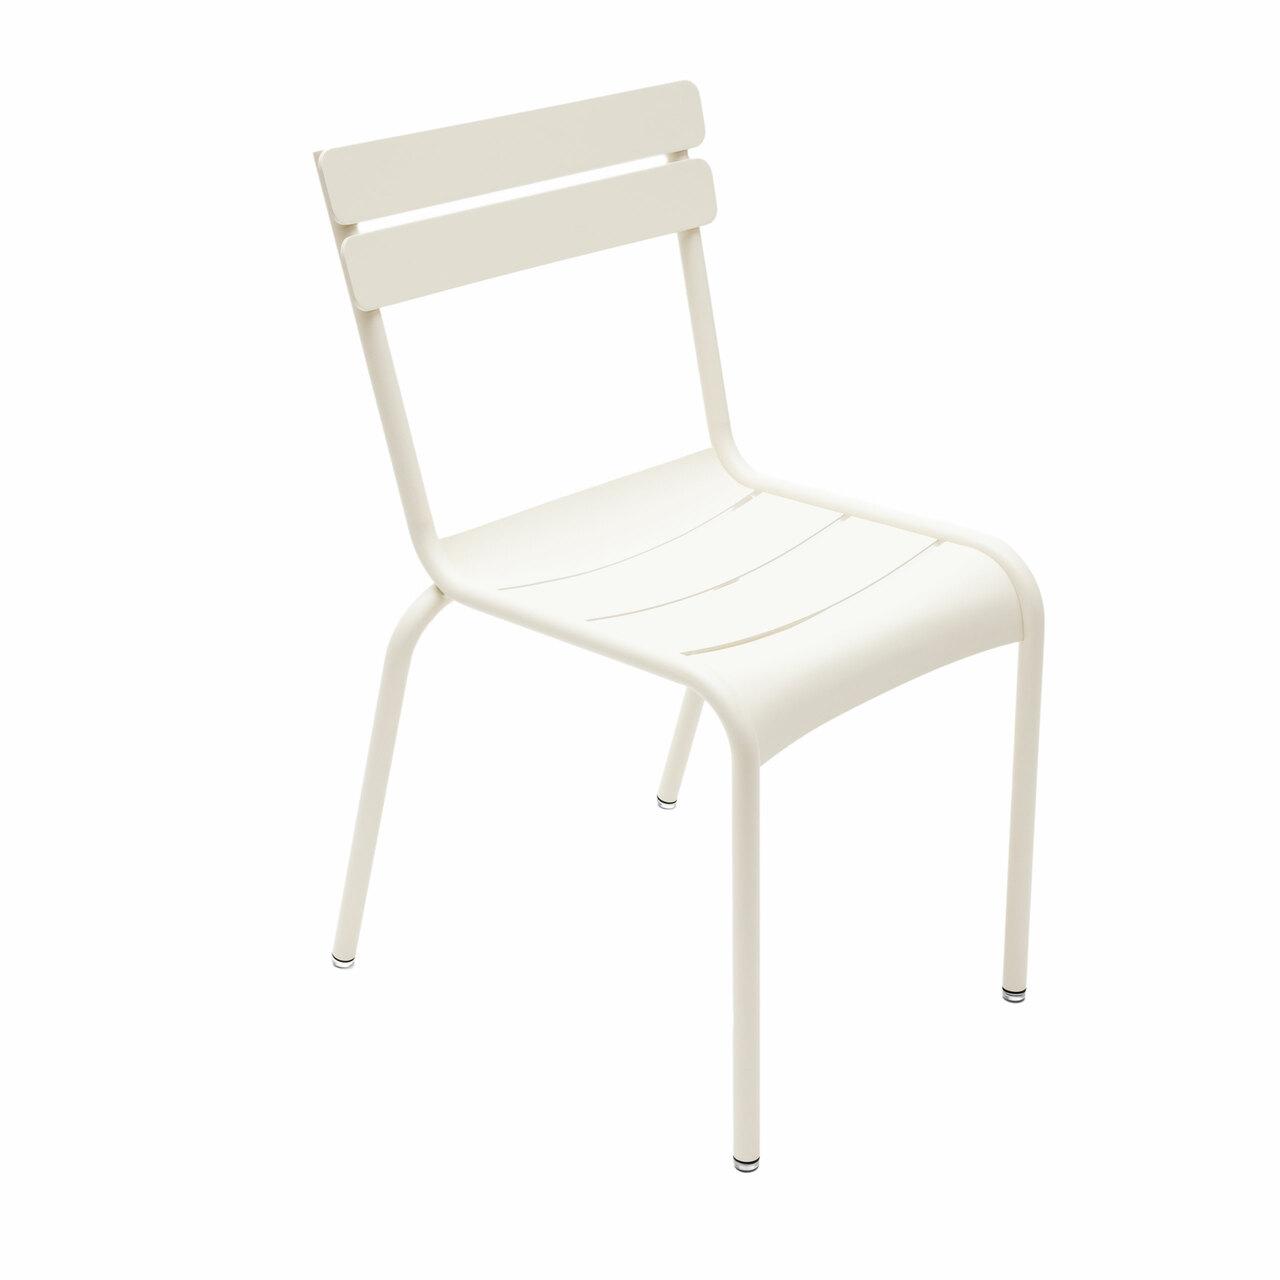 Fermob Luxembourg Stuhl  Perlweiss - RAL 1013,  Stuhl ohne Armlehnen